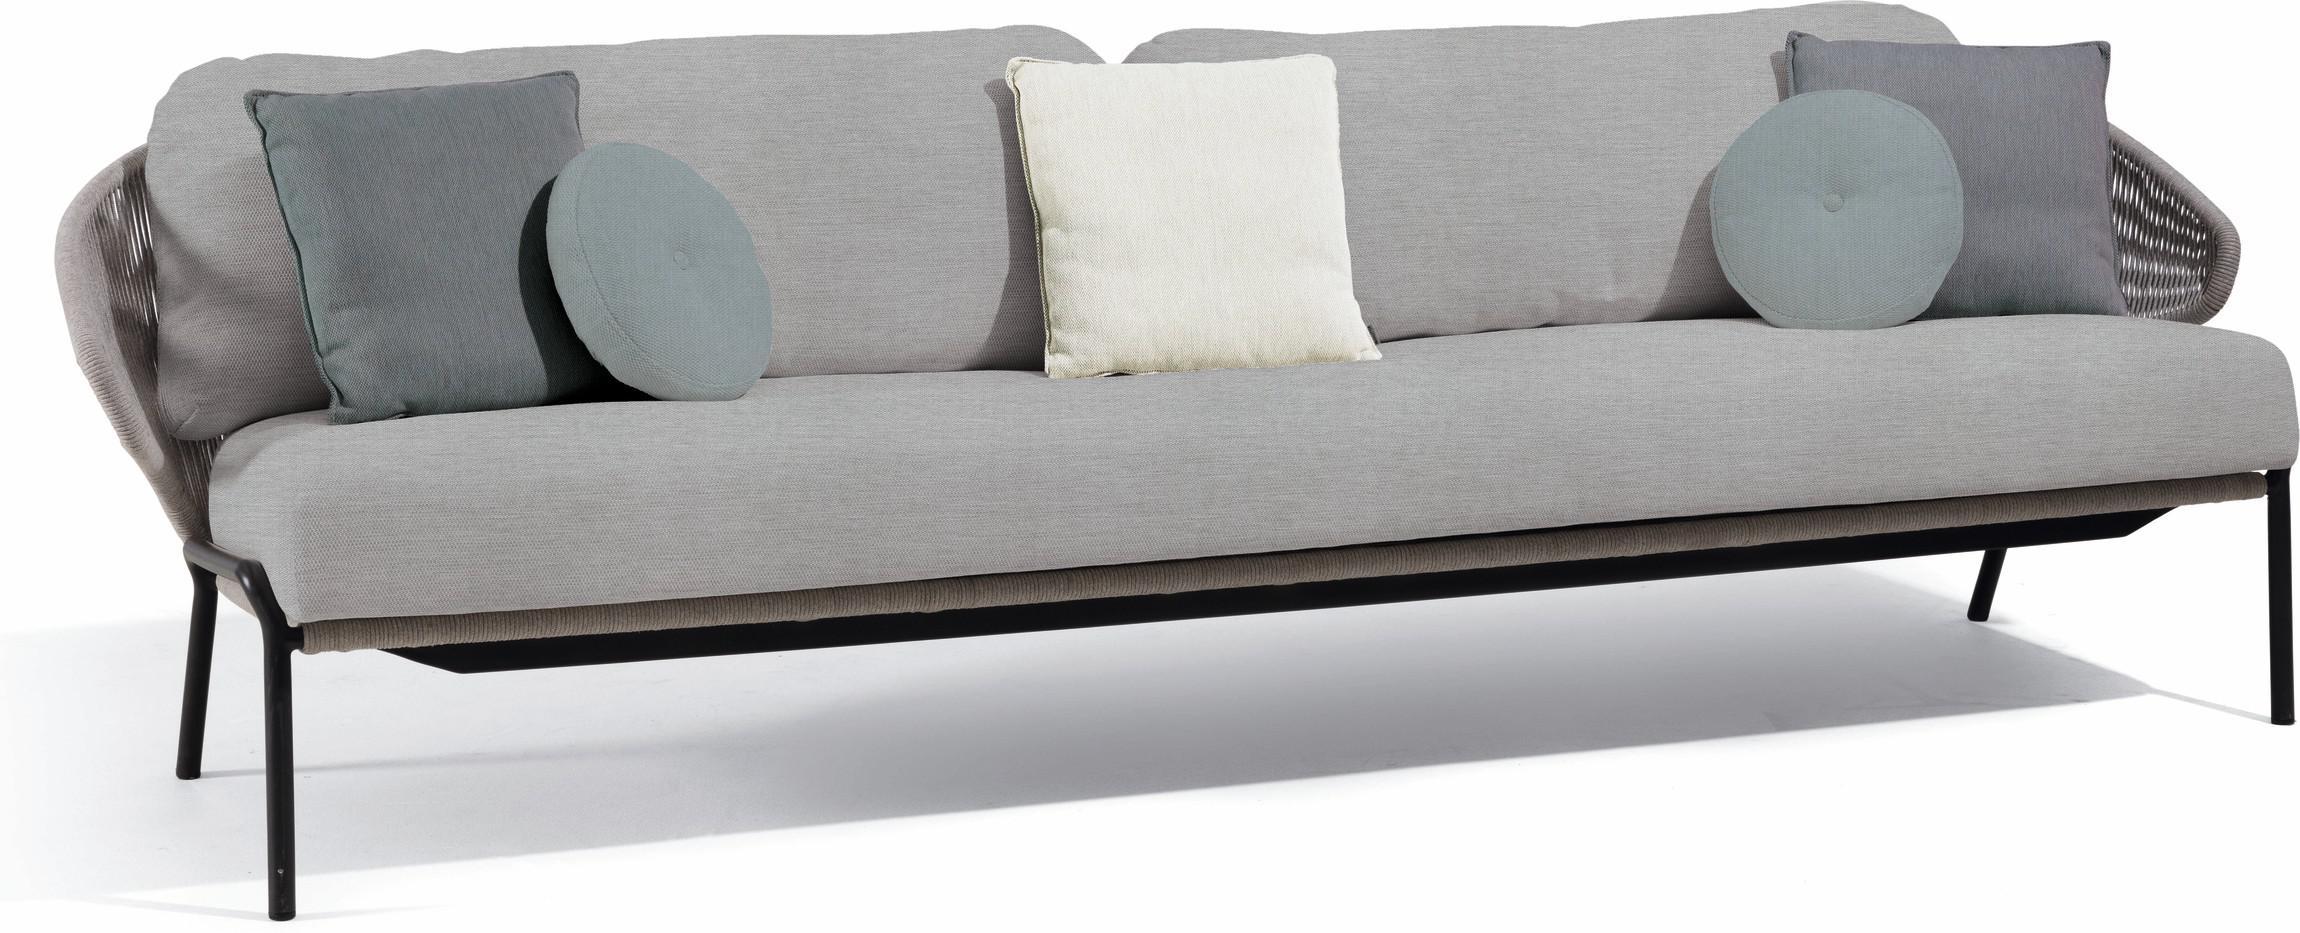 Radius 3S - Sofa fixed - lava - silver